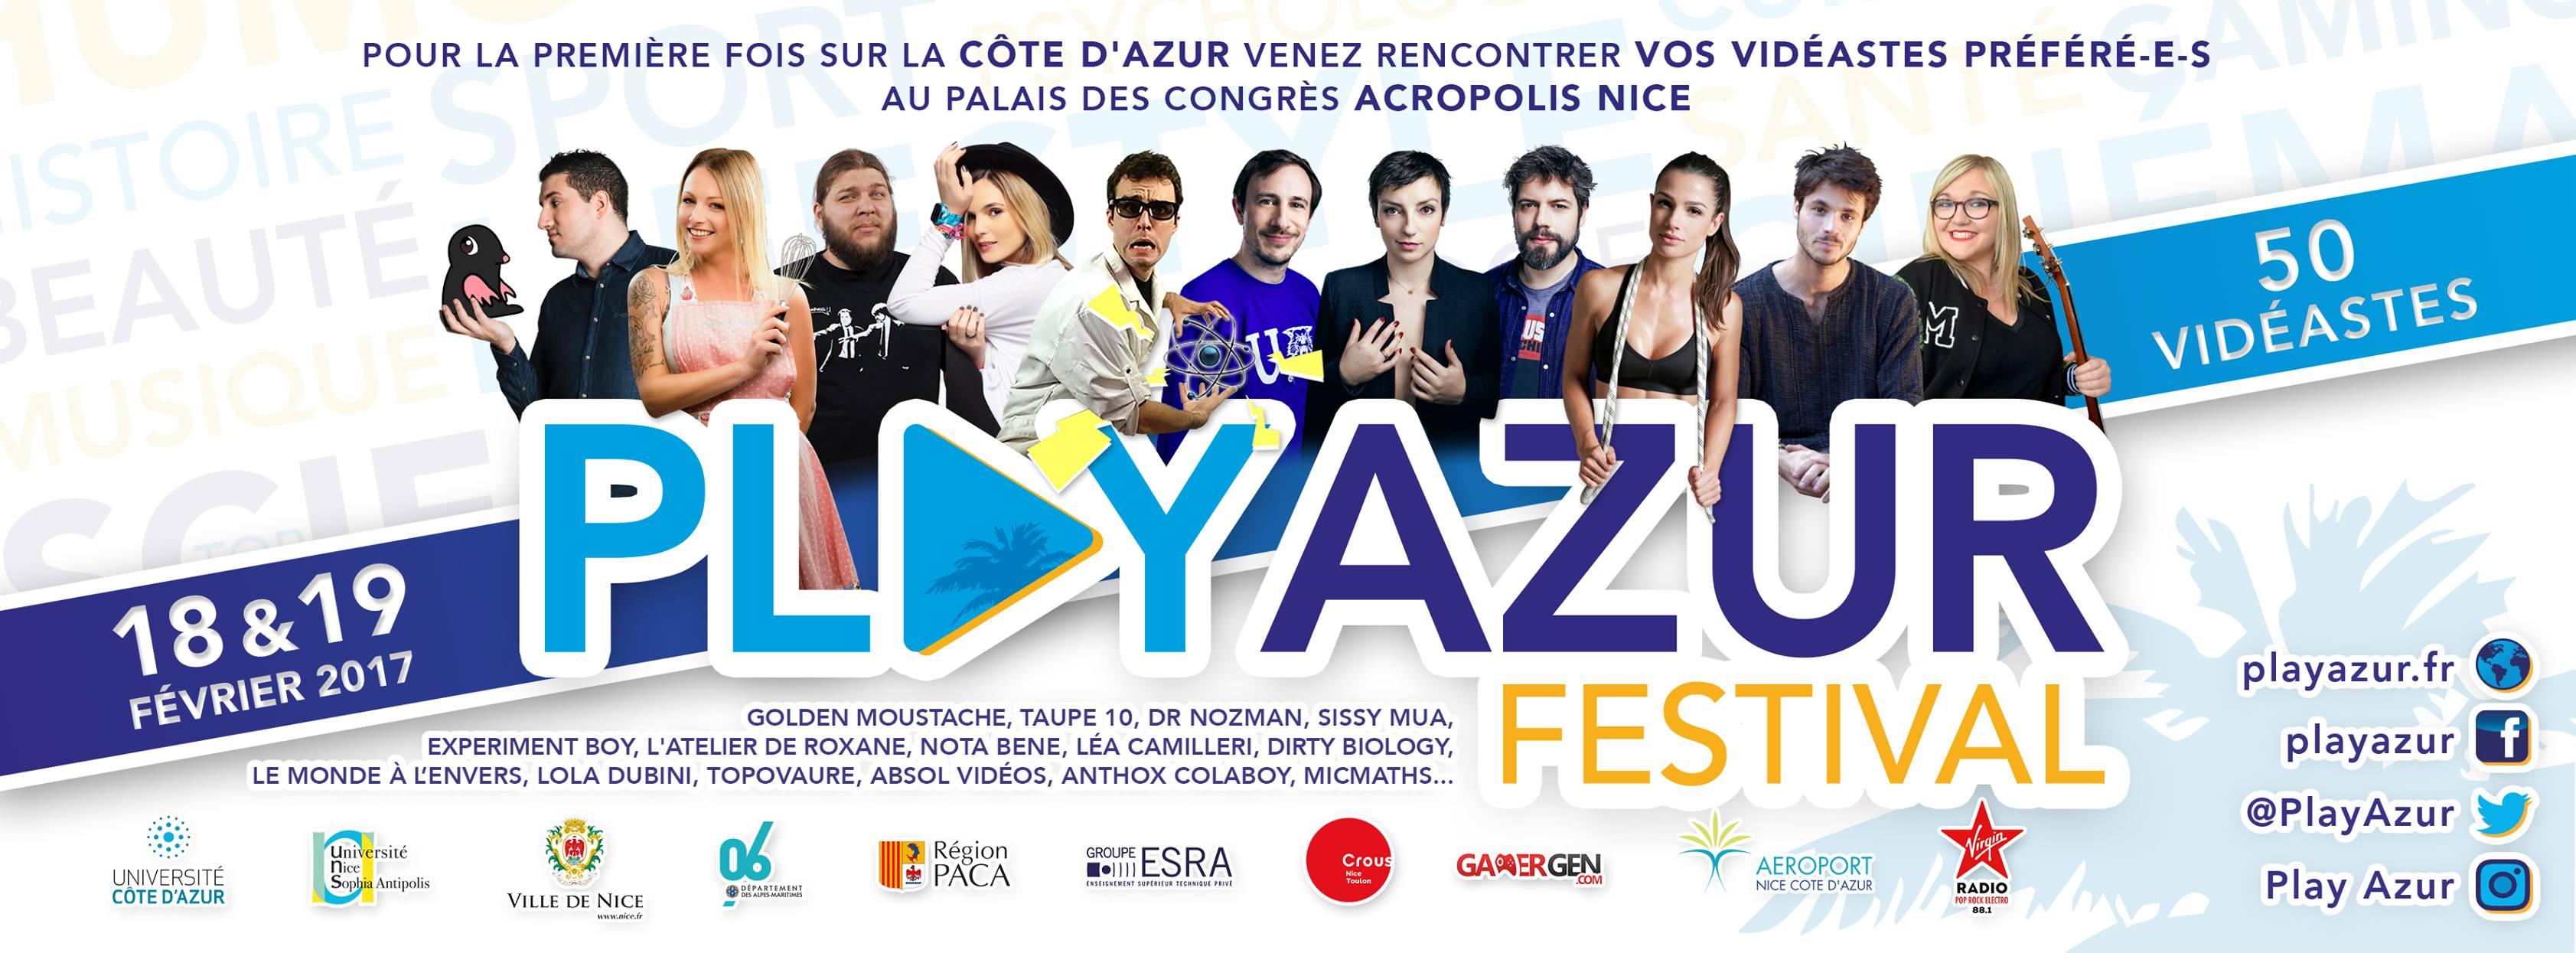 play_azur_festival_nice